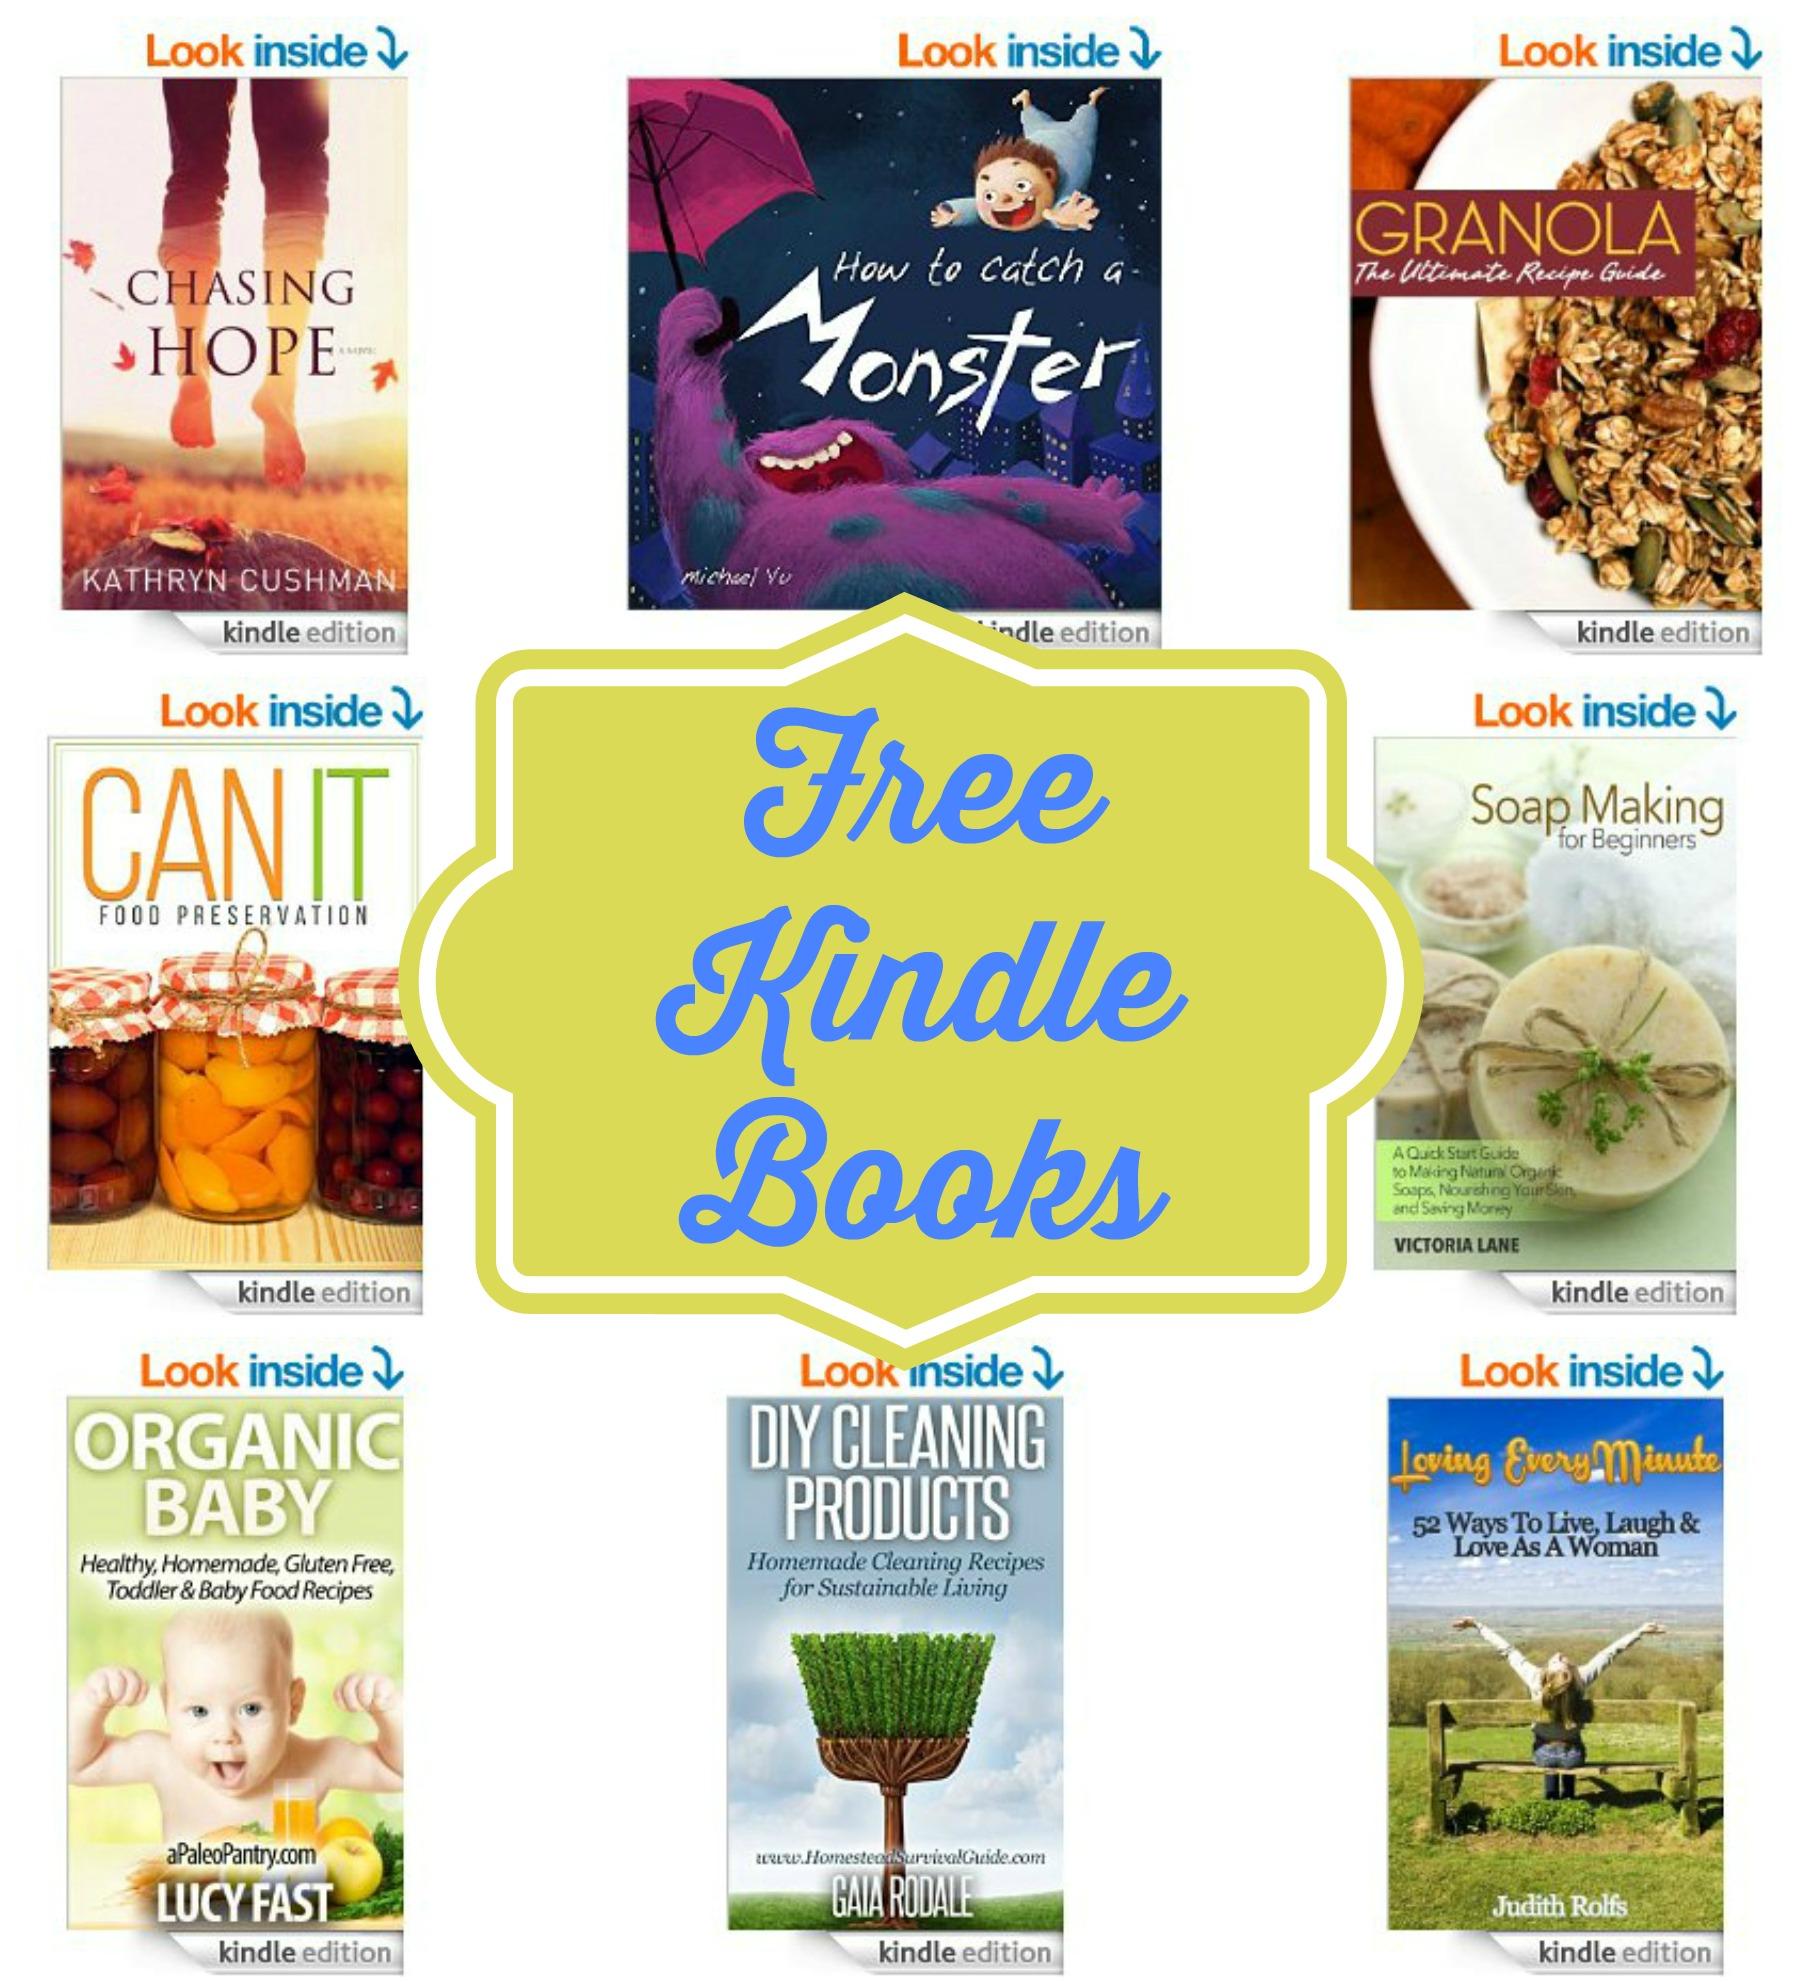 17 Free Kindle Books Chasing Hope Organic Baby Easy